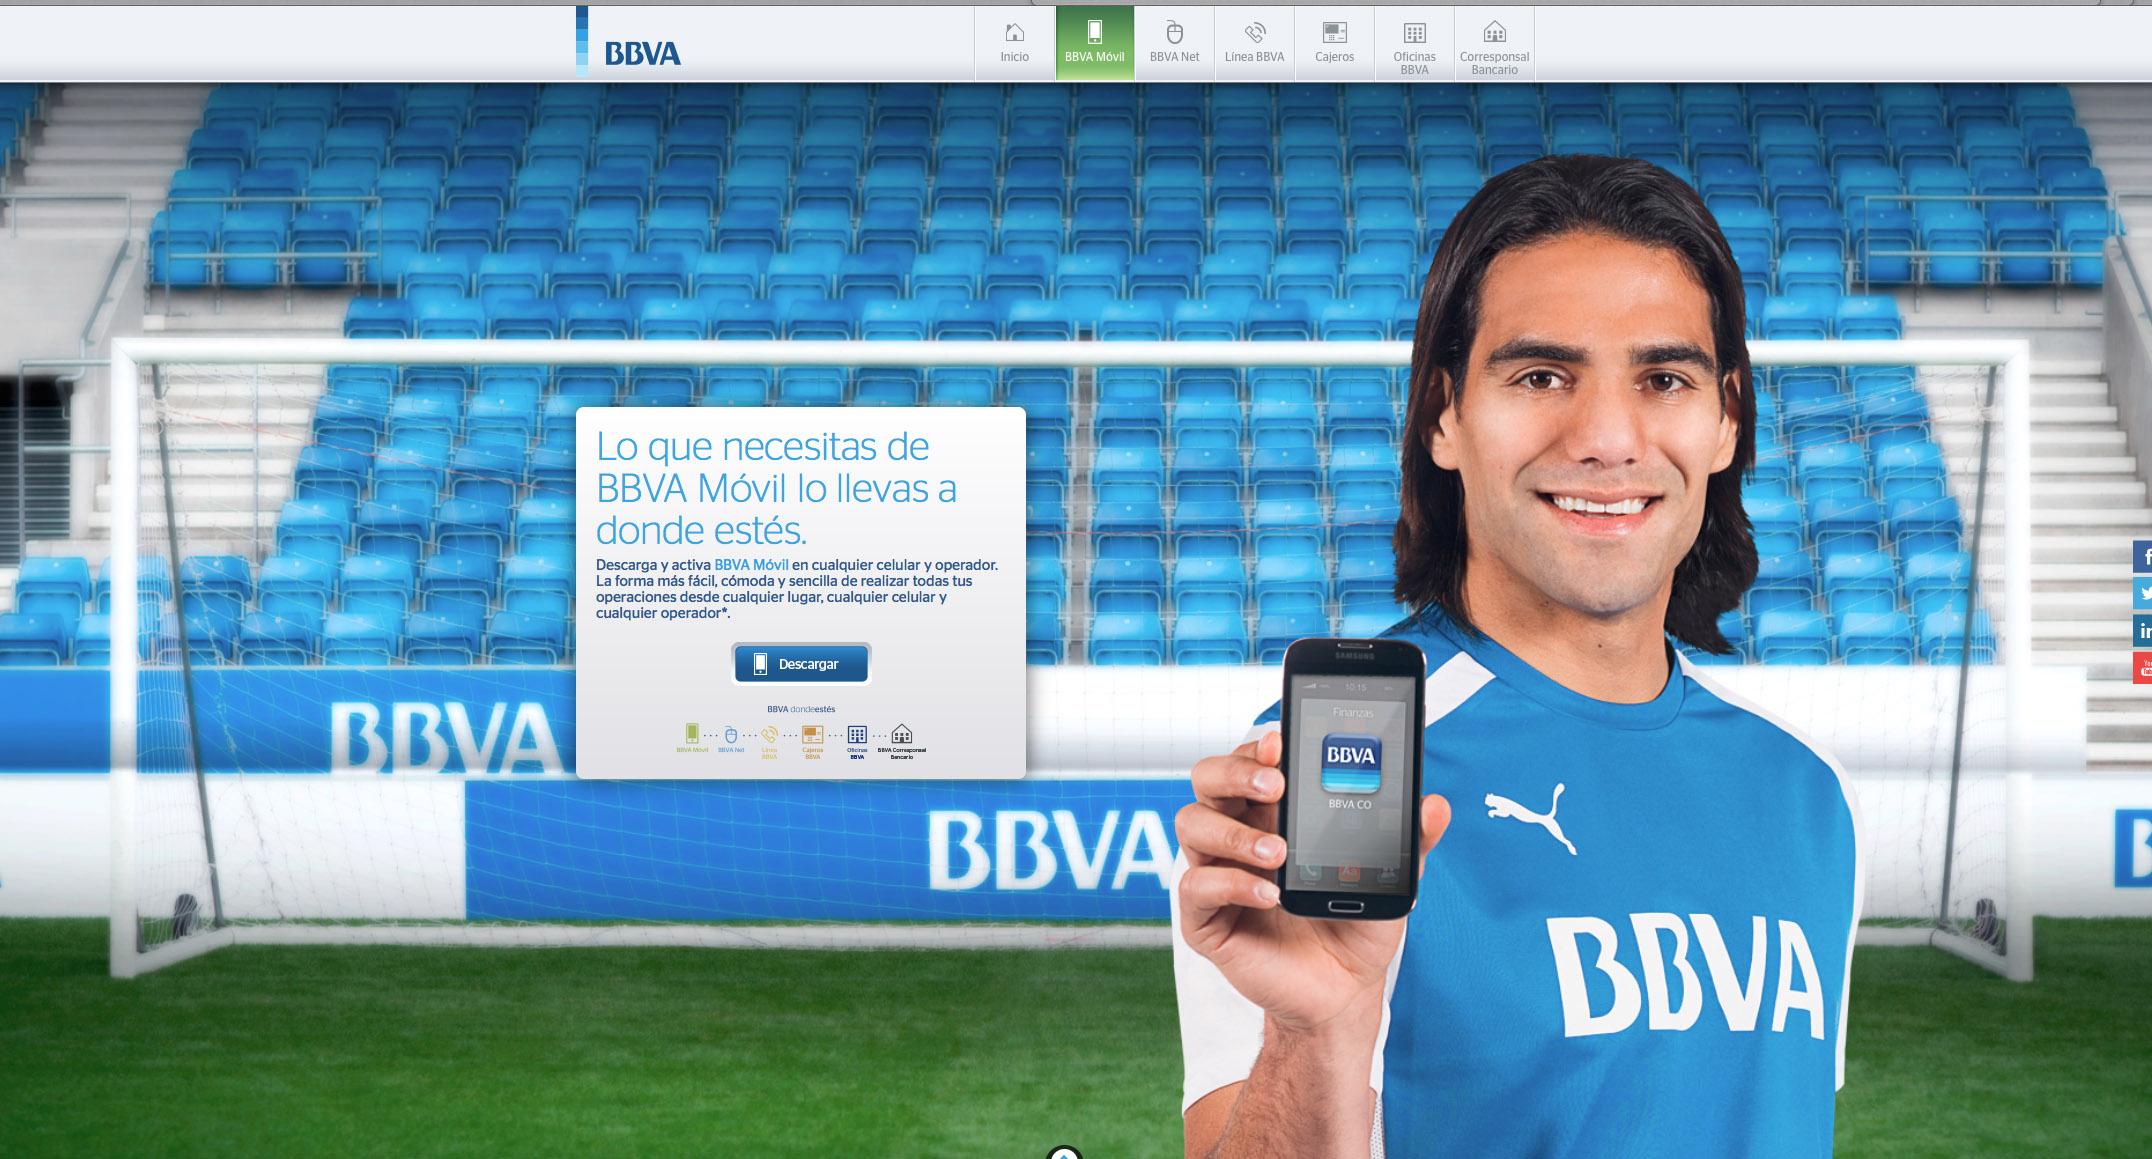 FALCAO FOR BBVA BANK